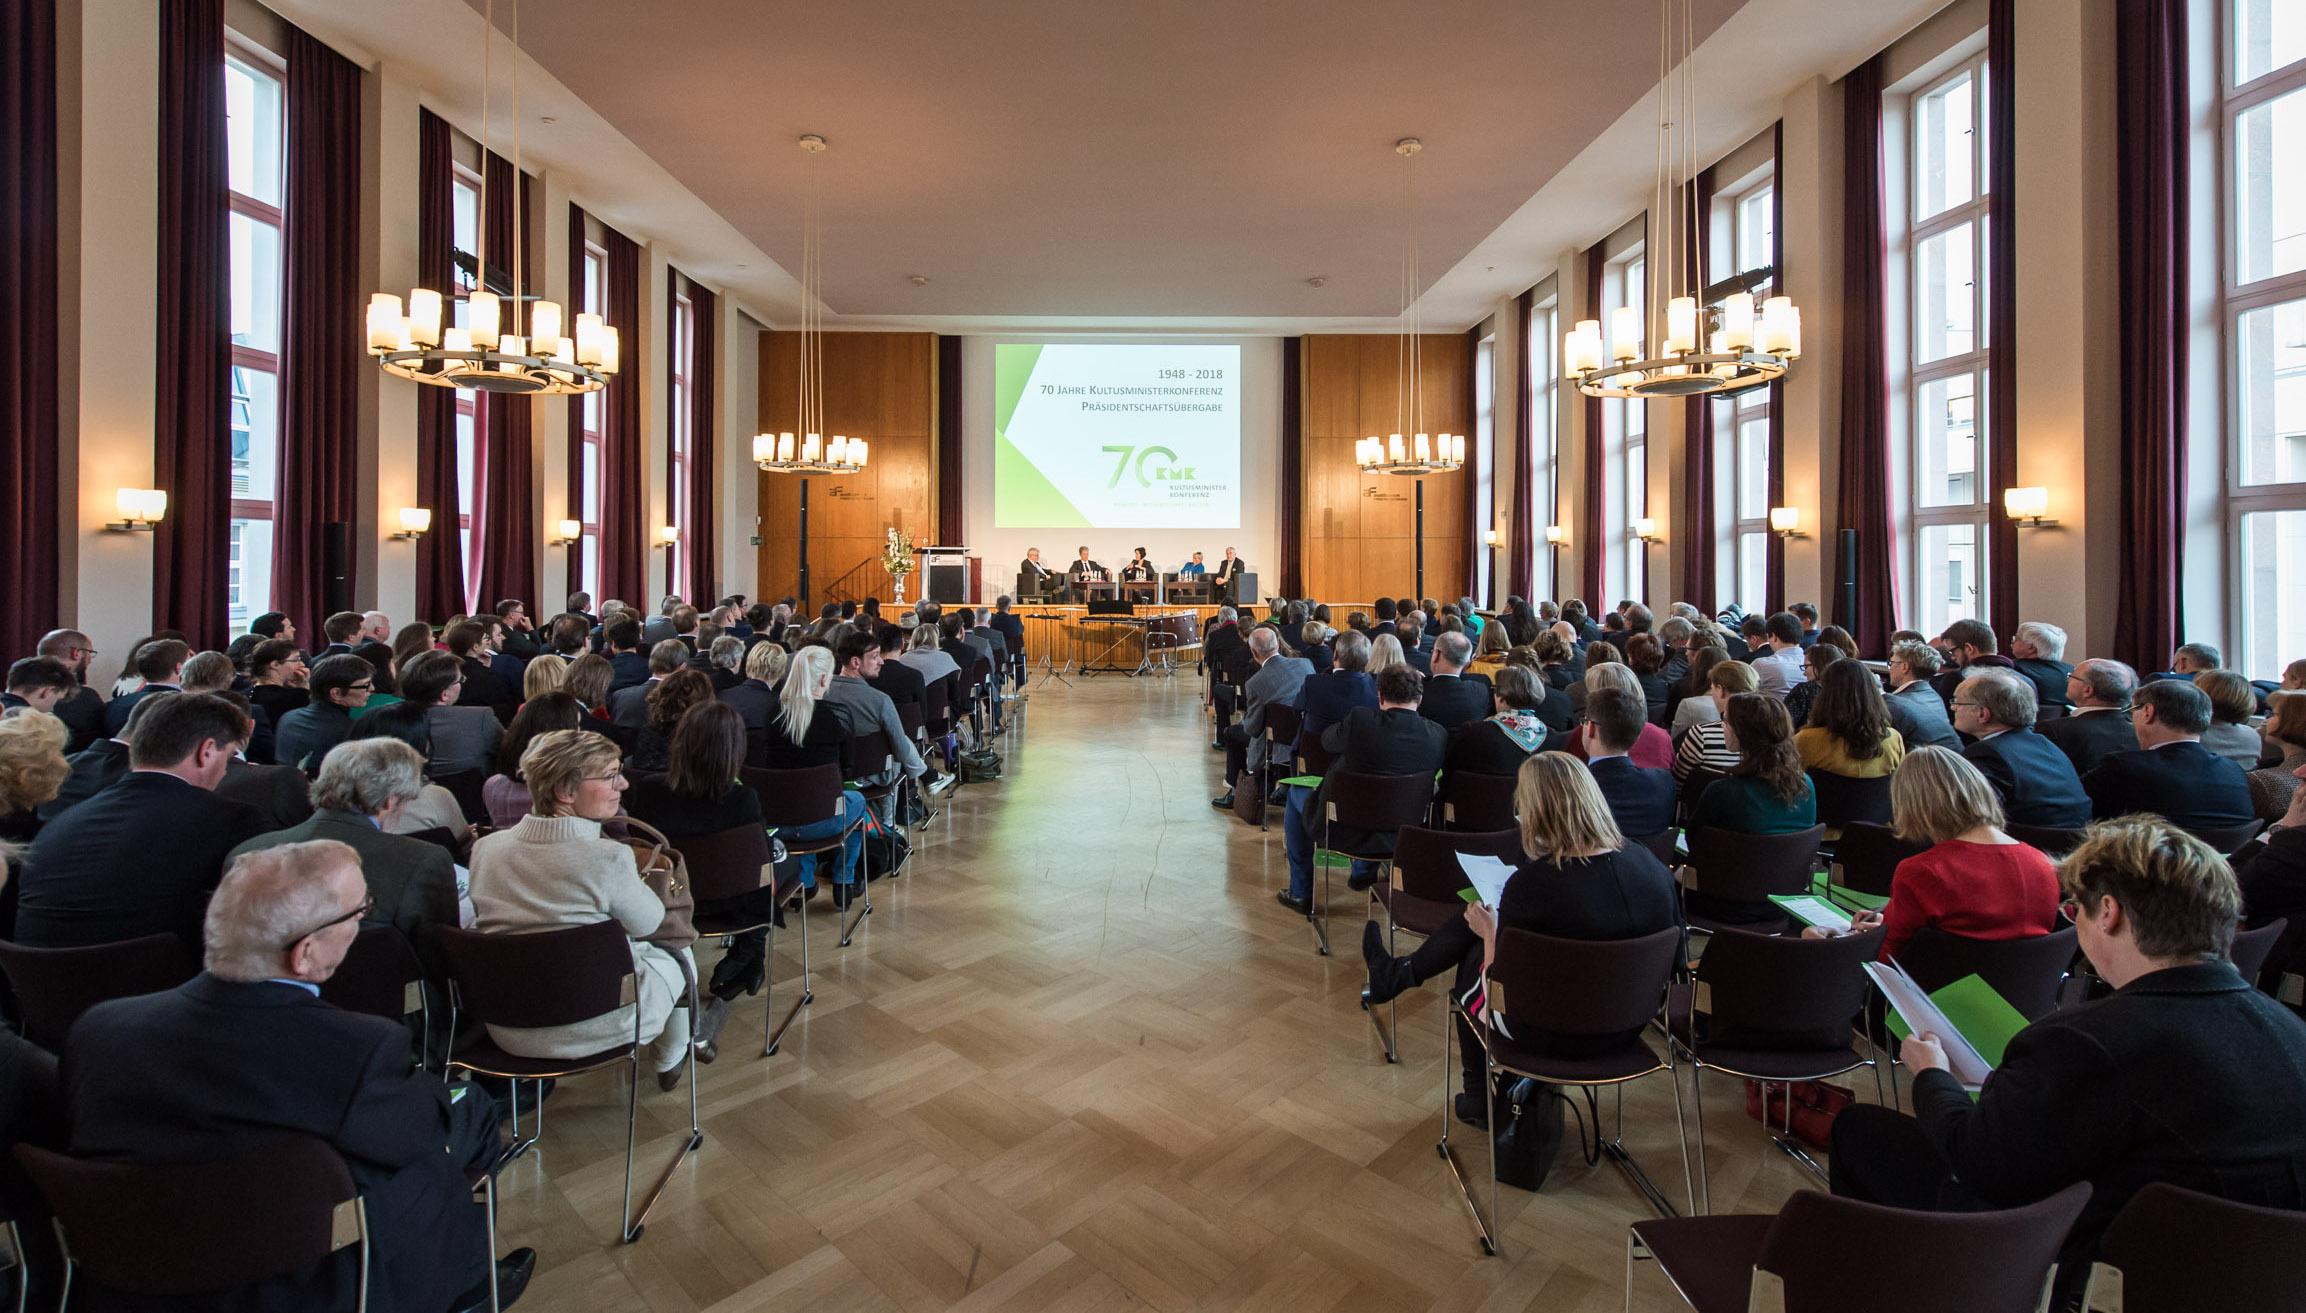 Festveranstaltung zu 70 Jahren Kultusministerkonferenz im Januar in Berlin. Foto: Ralf Rühmeier